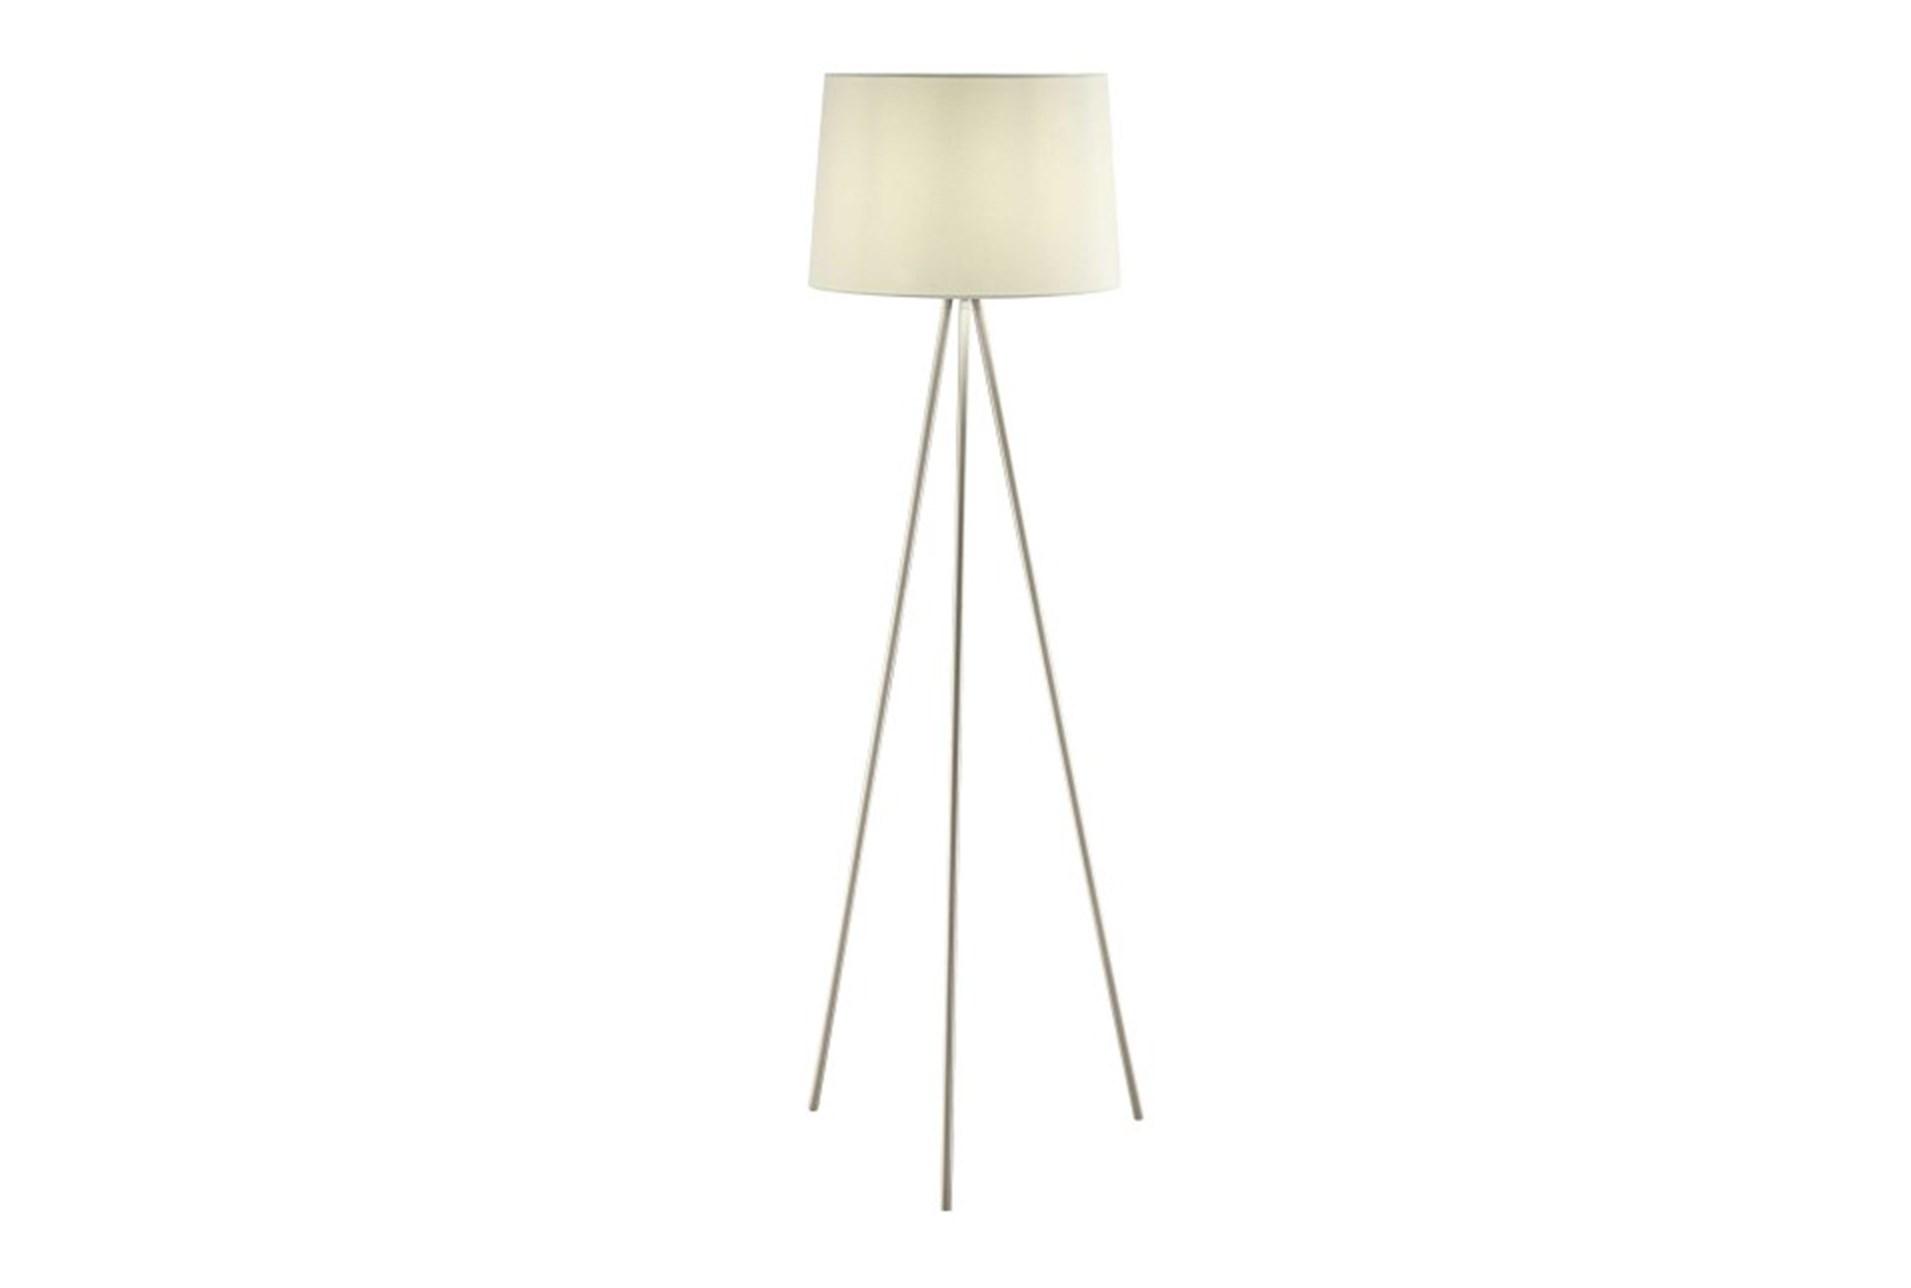 living spaces floor lamps living room floor lampspectra nickel 360 living spaces